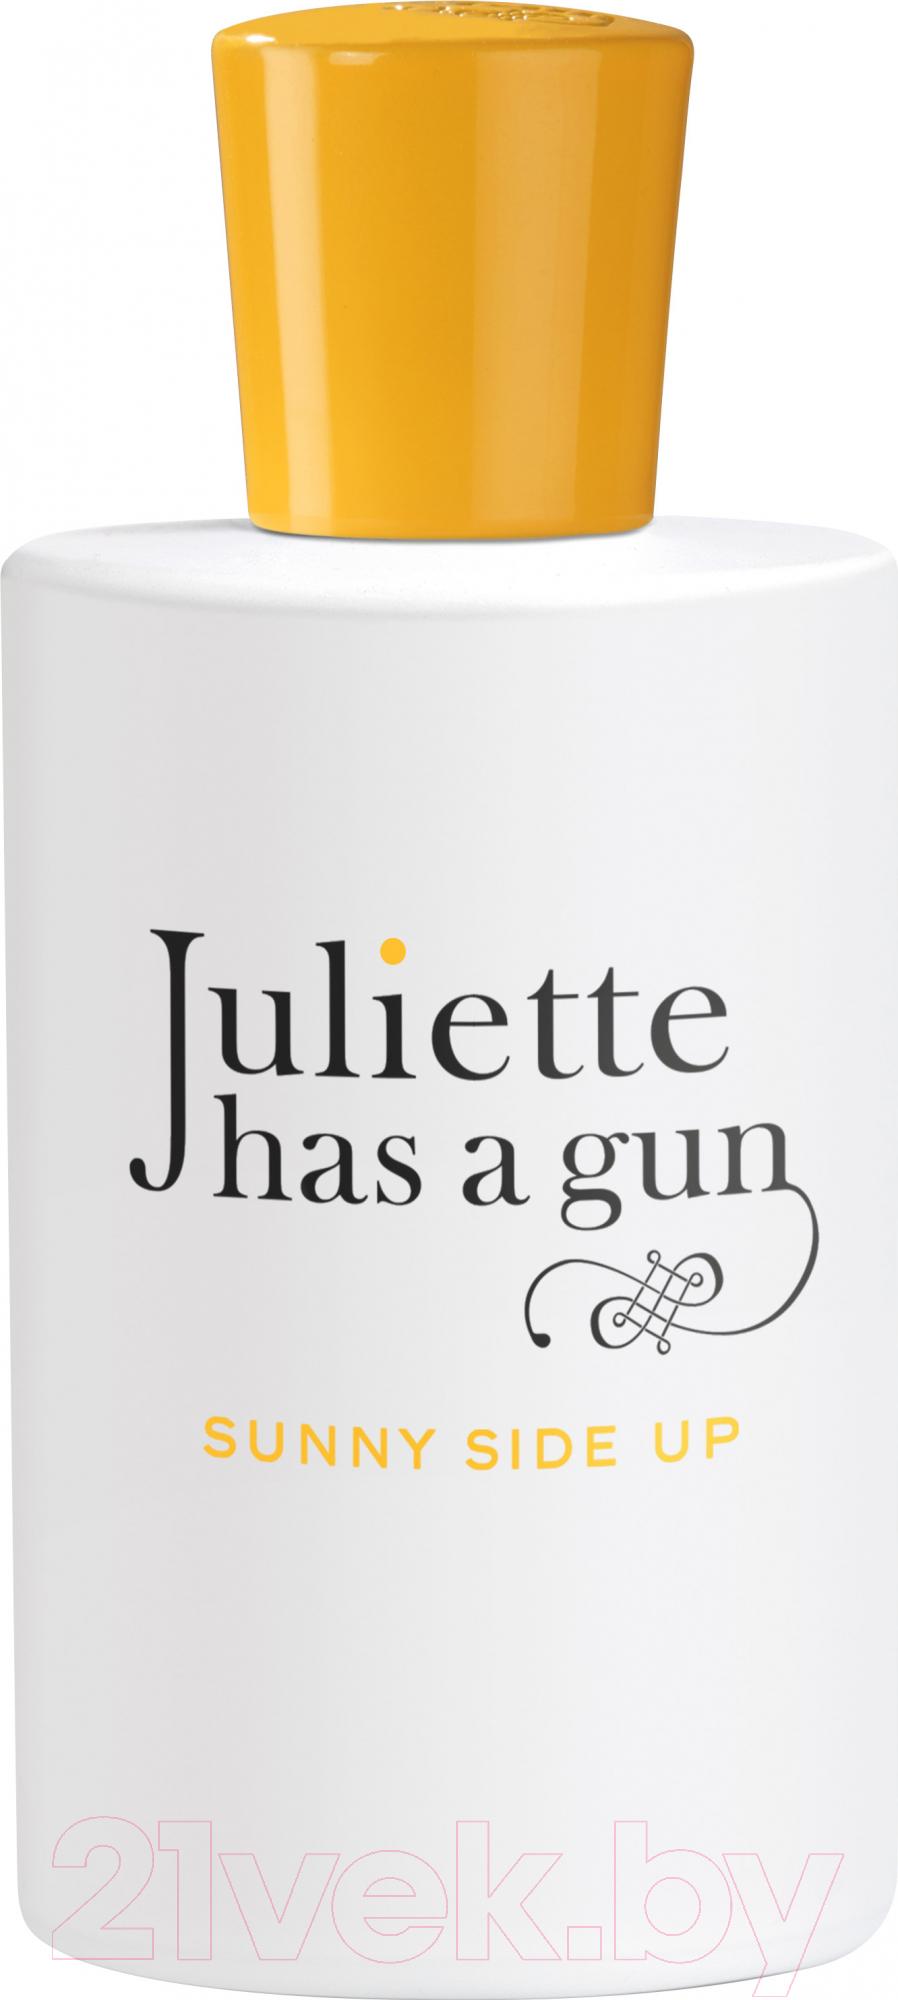 Купить Парфюмерная вода Juliette Has A Gun, Sunny Side Up (100мл), Франция